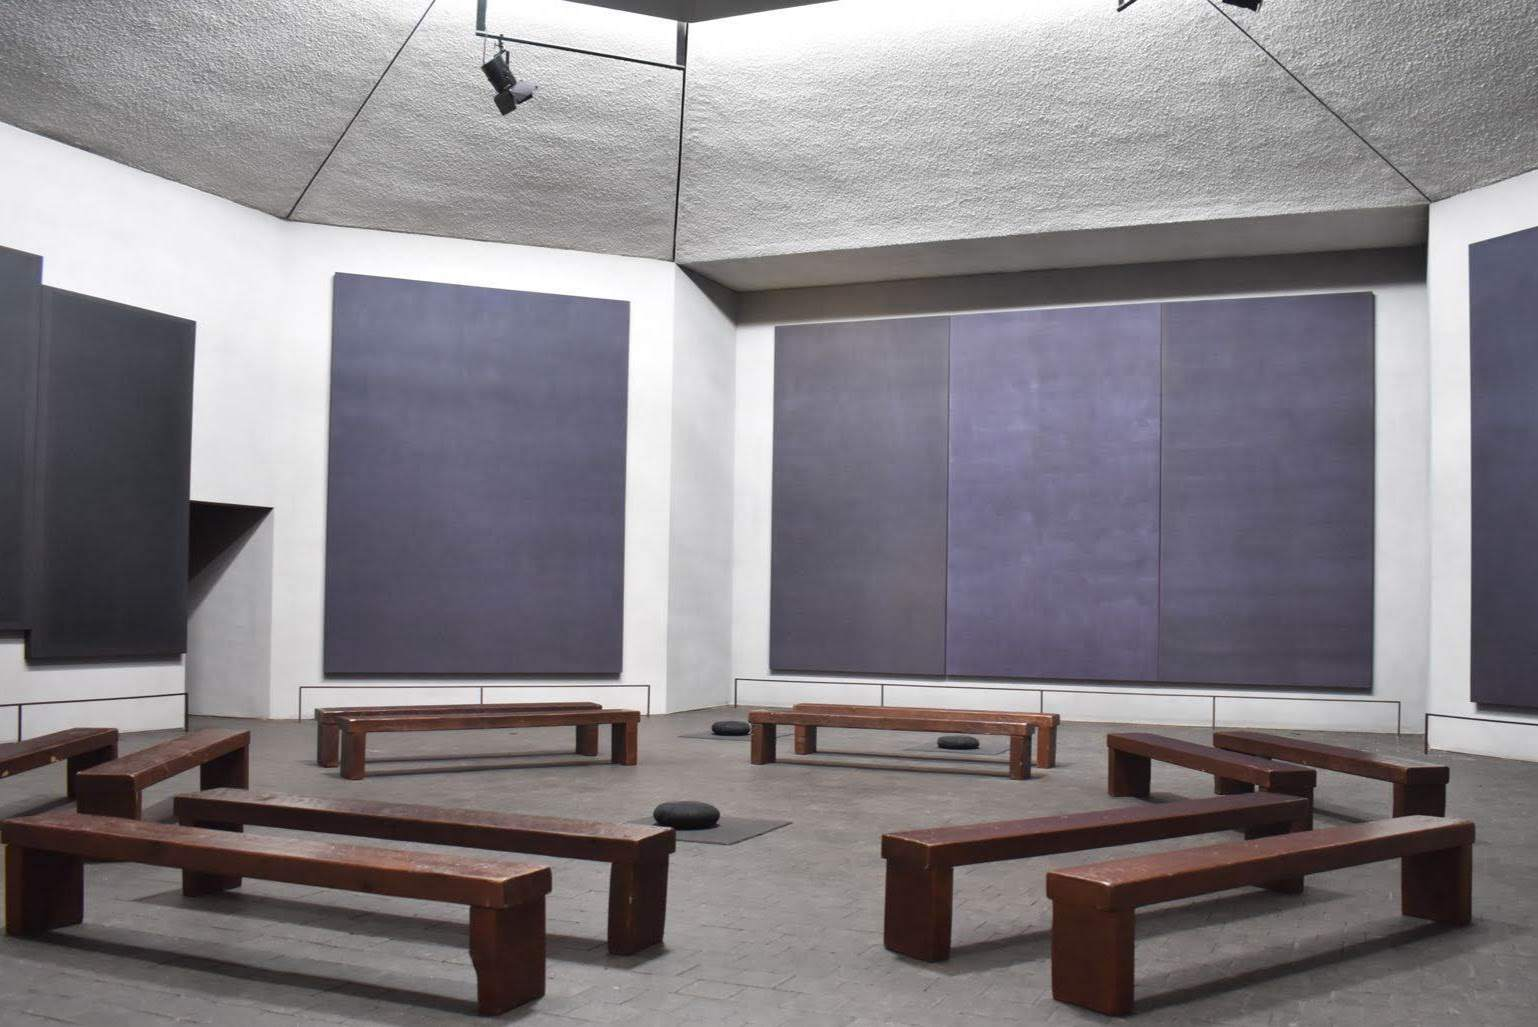 Meditation benches